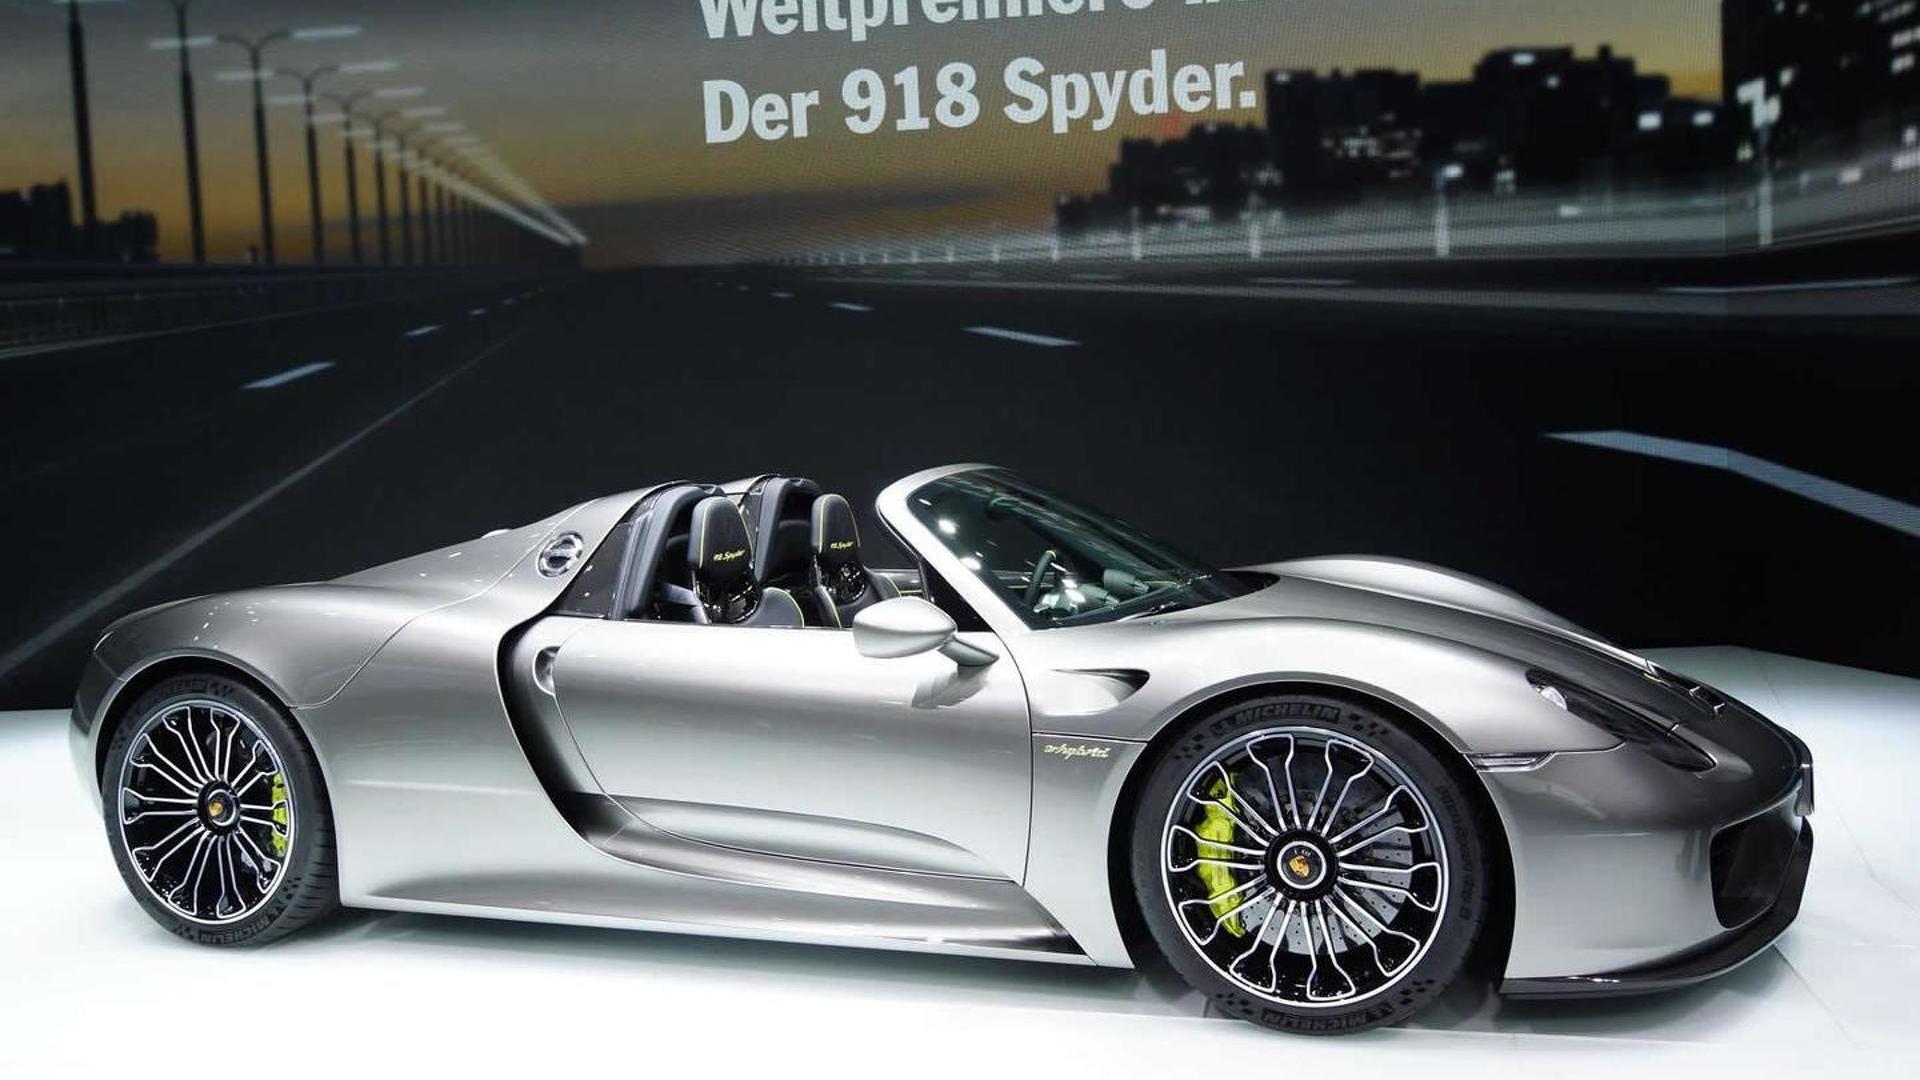 2013-410737-porsche-918-spyder-production-model-live-at-2013-frankfurt-motor-show1 Interesting Porsche 918 Spyder Weissach Package Prijs Cars Trend